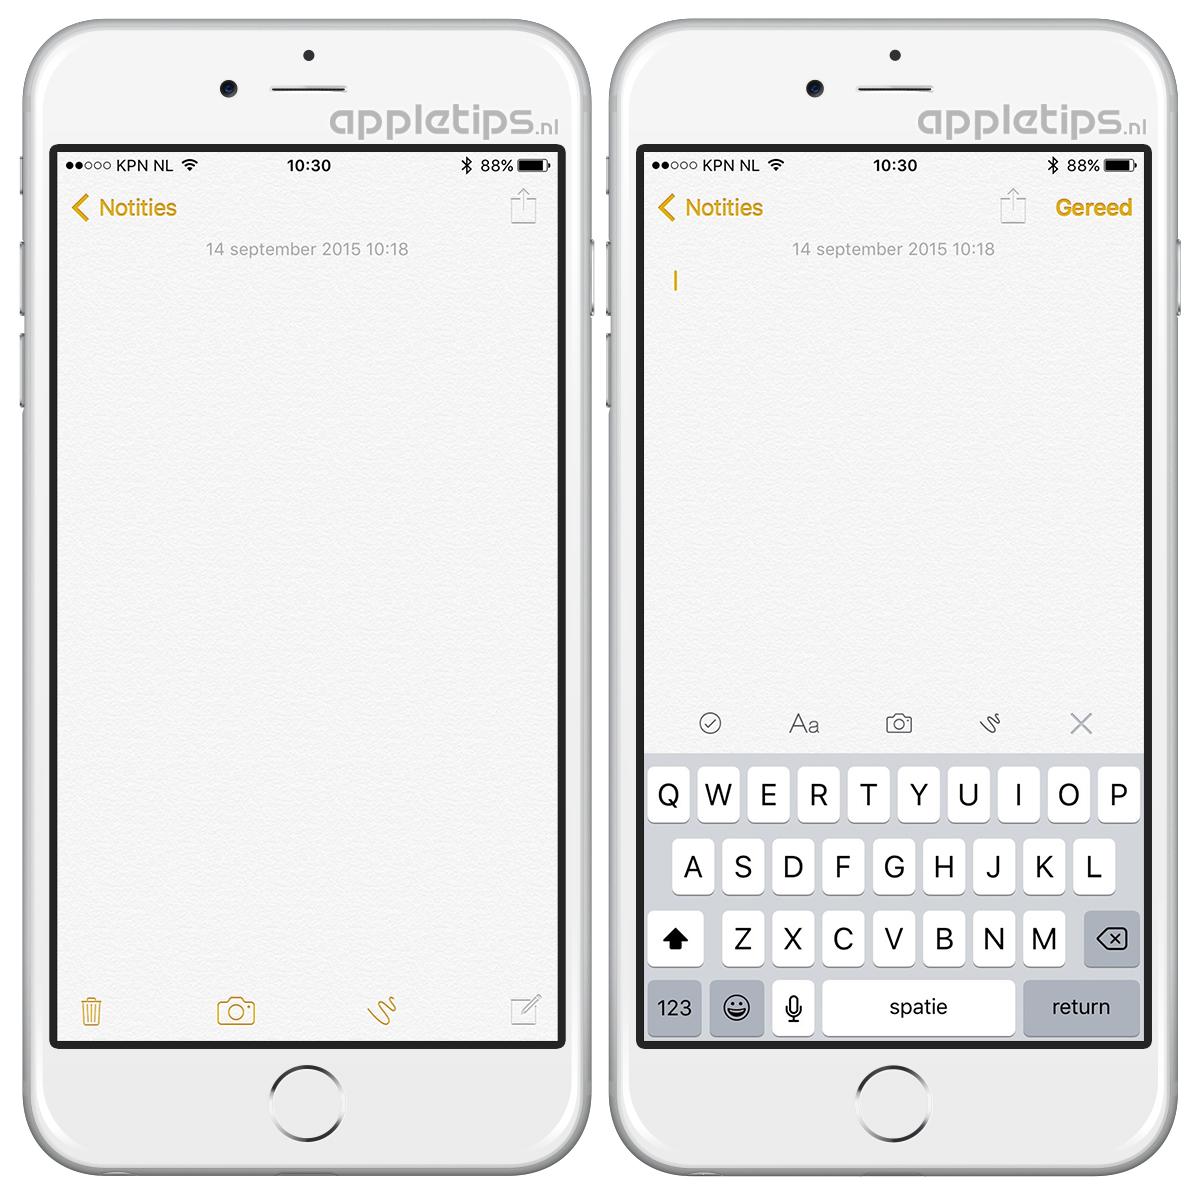 Inruilen met Apple GiveBack - Apple (NL)